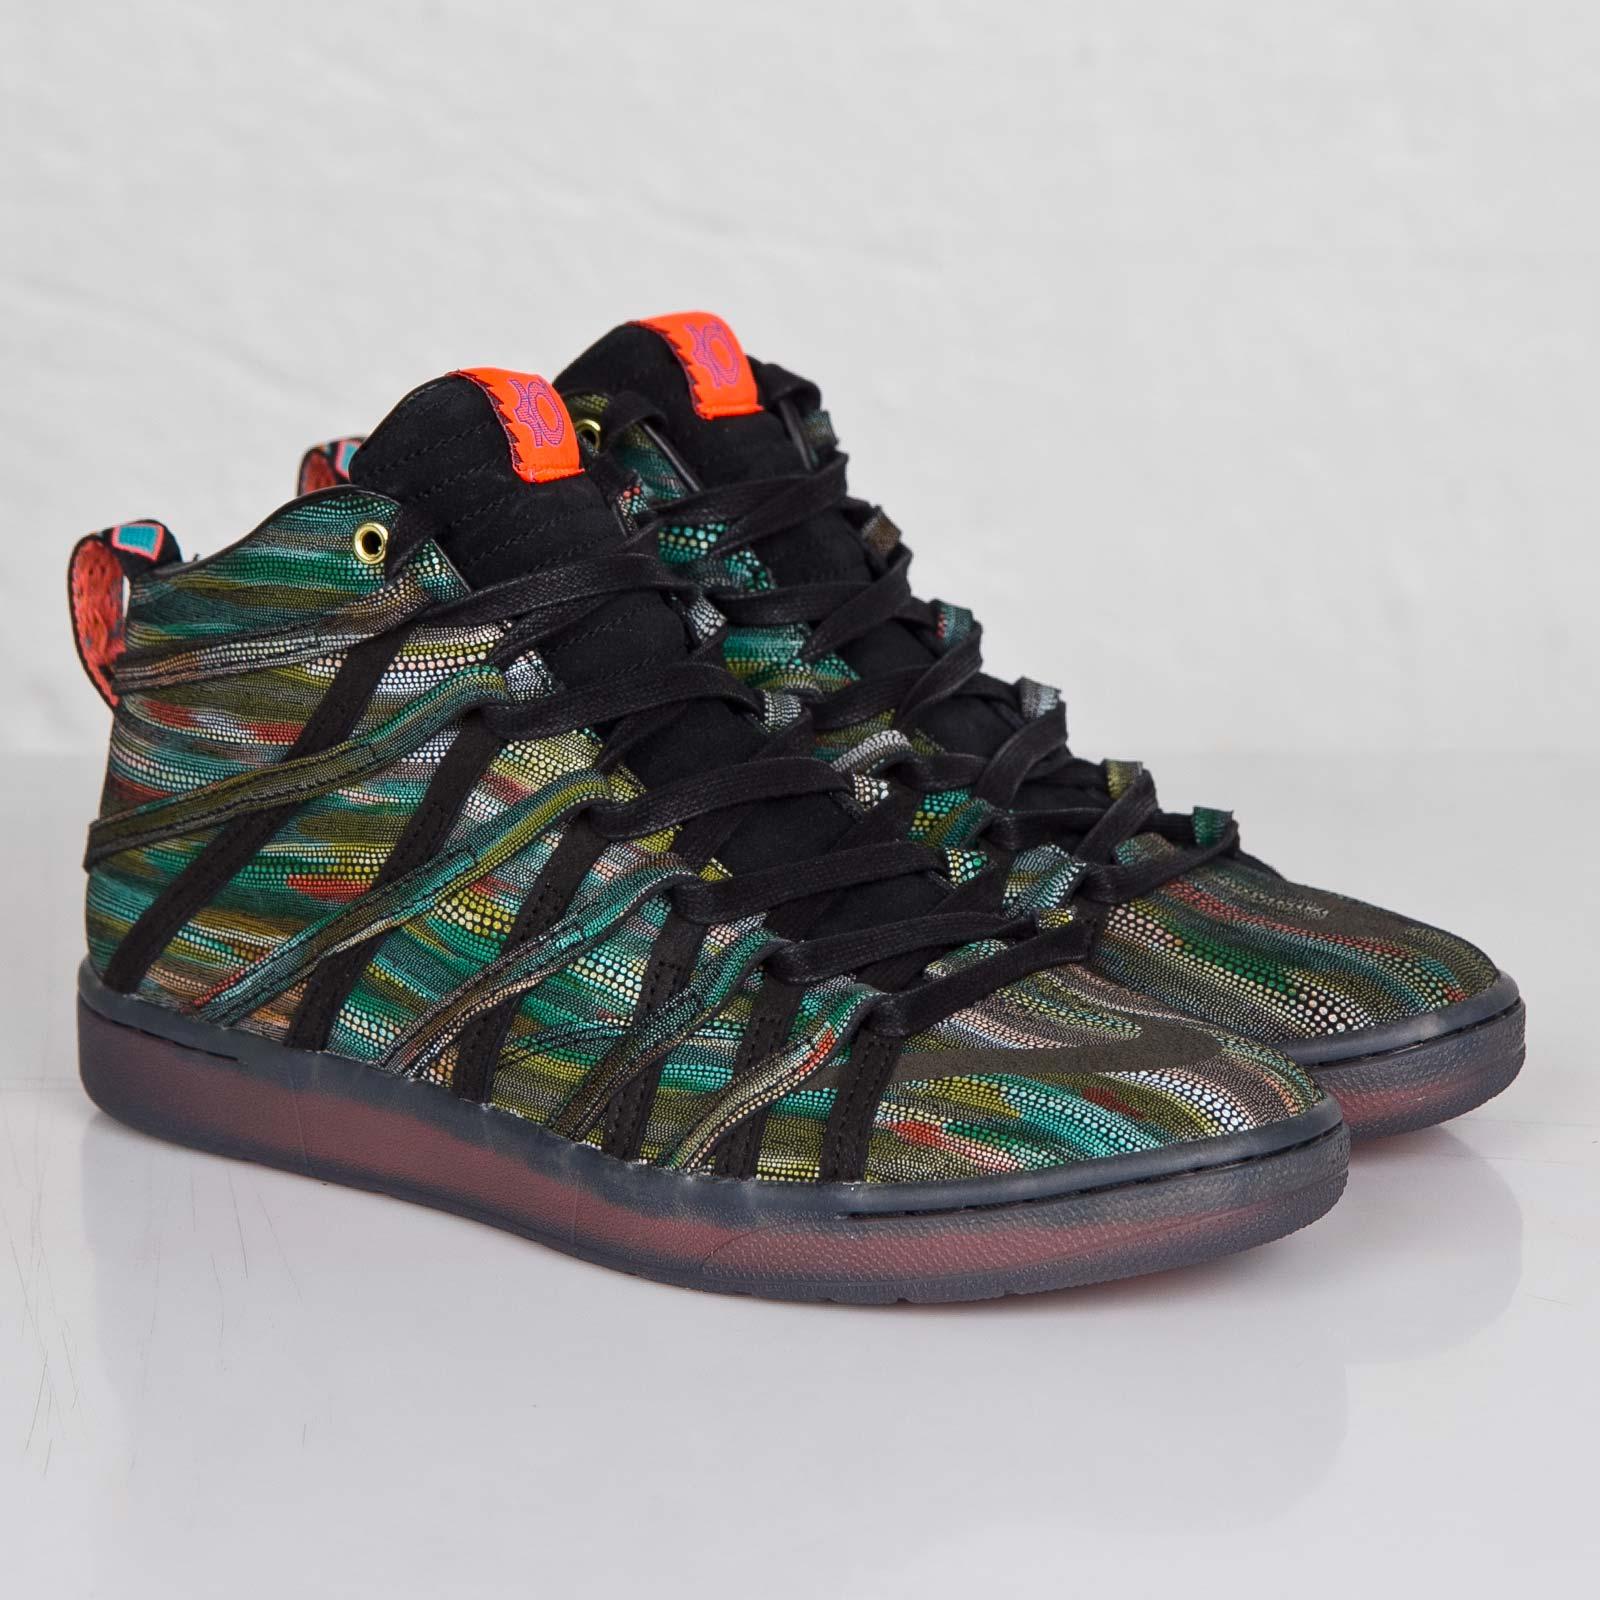 baec23565ef1 Nike KD VII Lifestyle PRM QS - 653872-002 - Sneakersnstuff ...